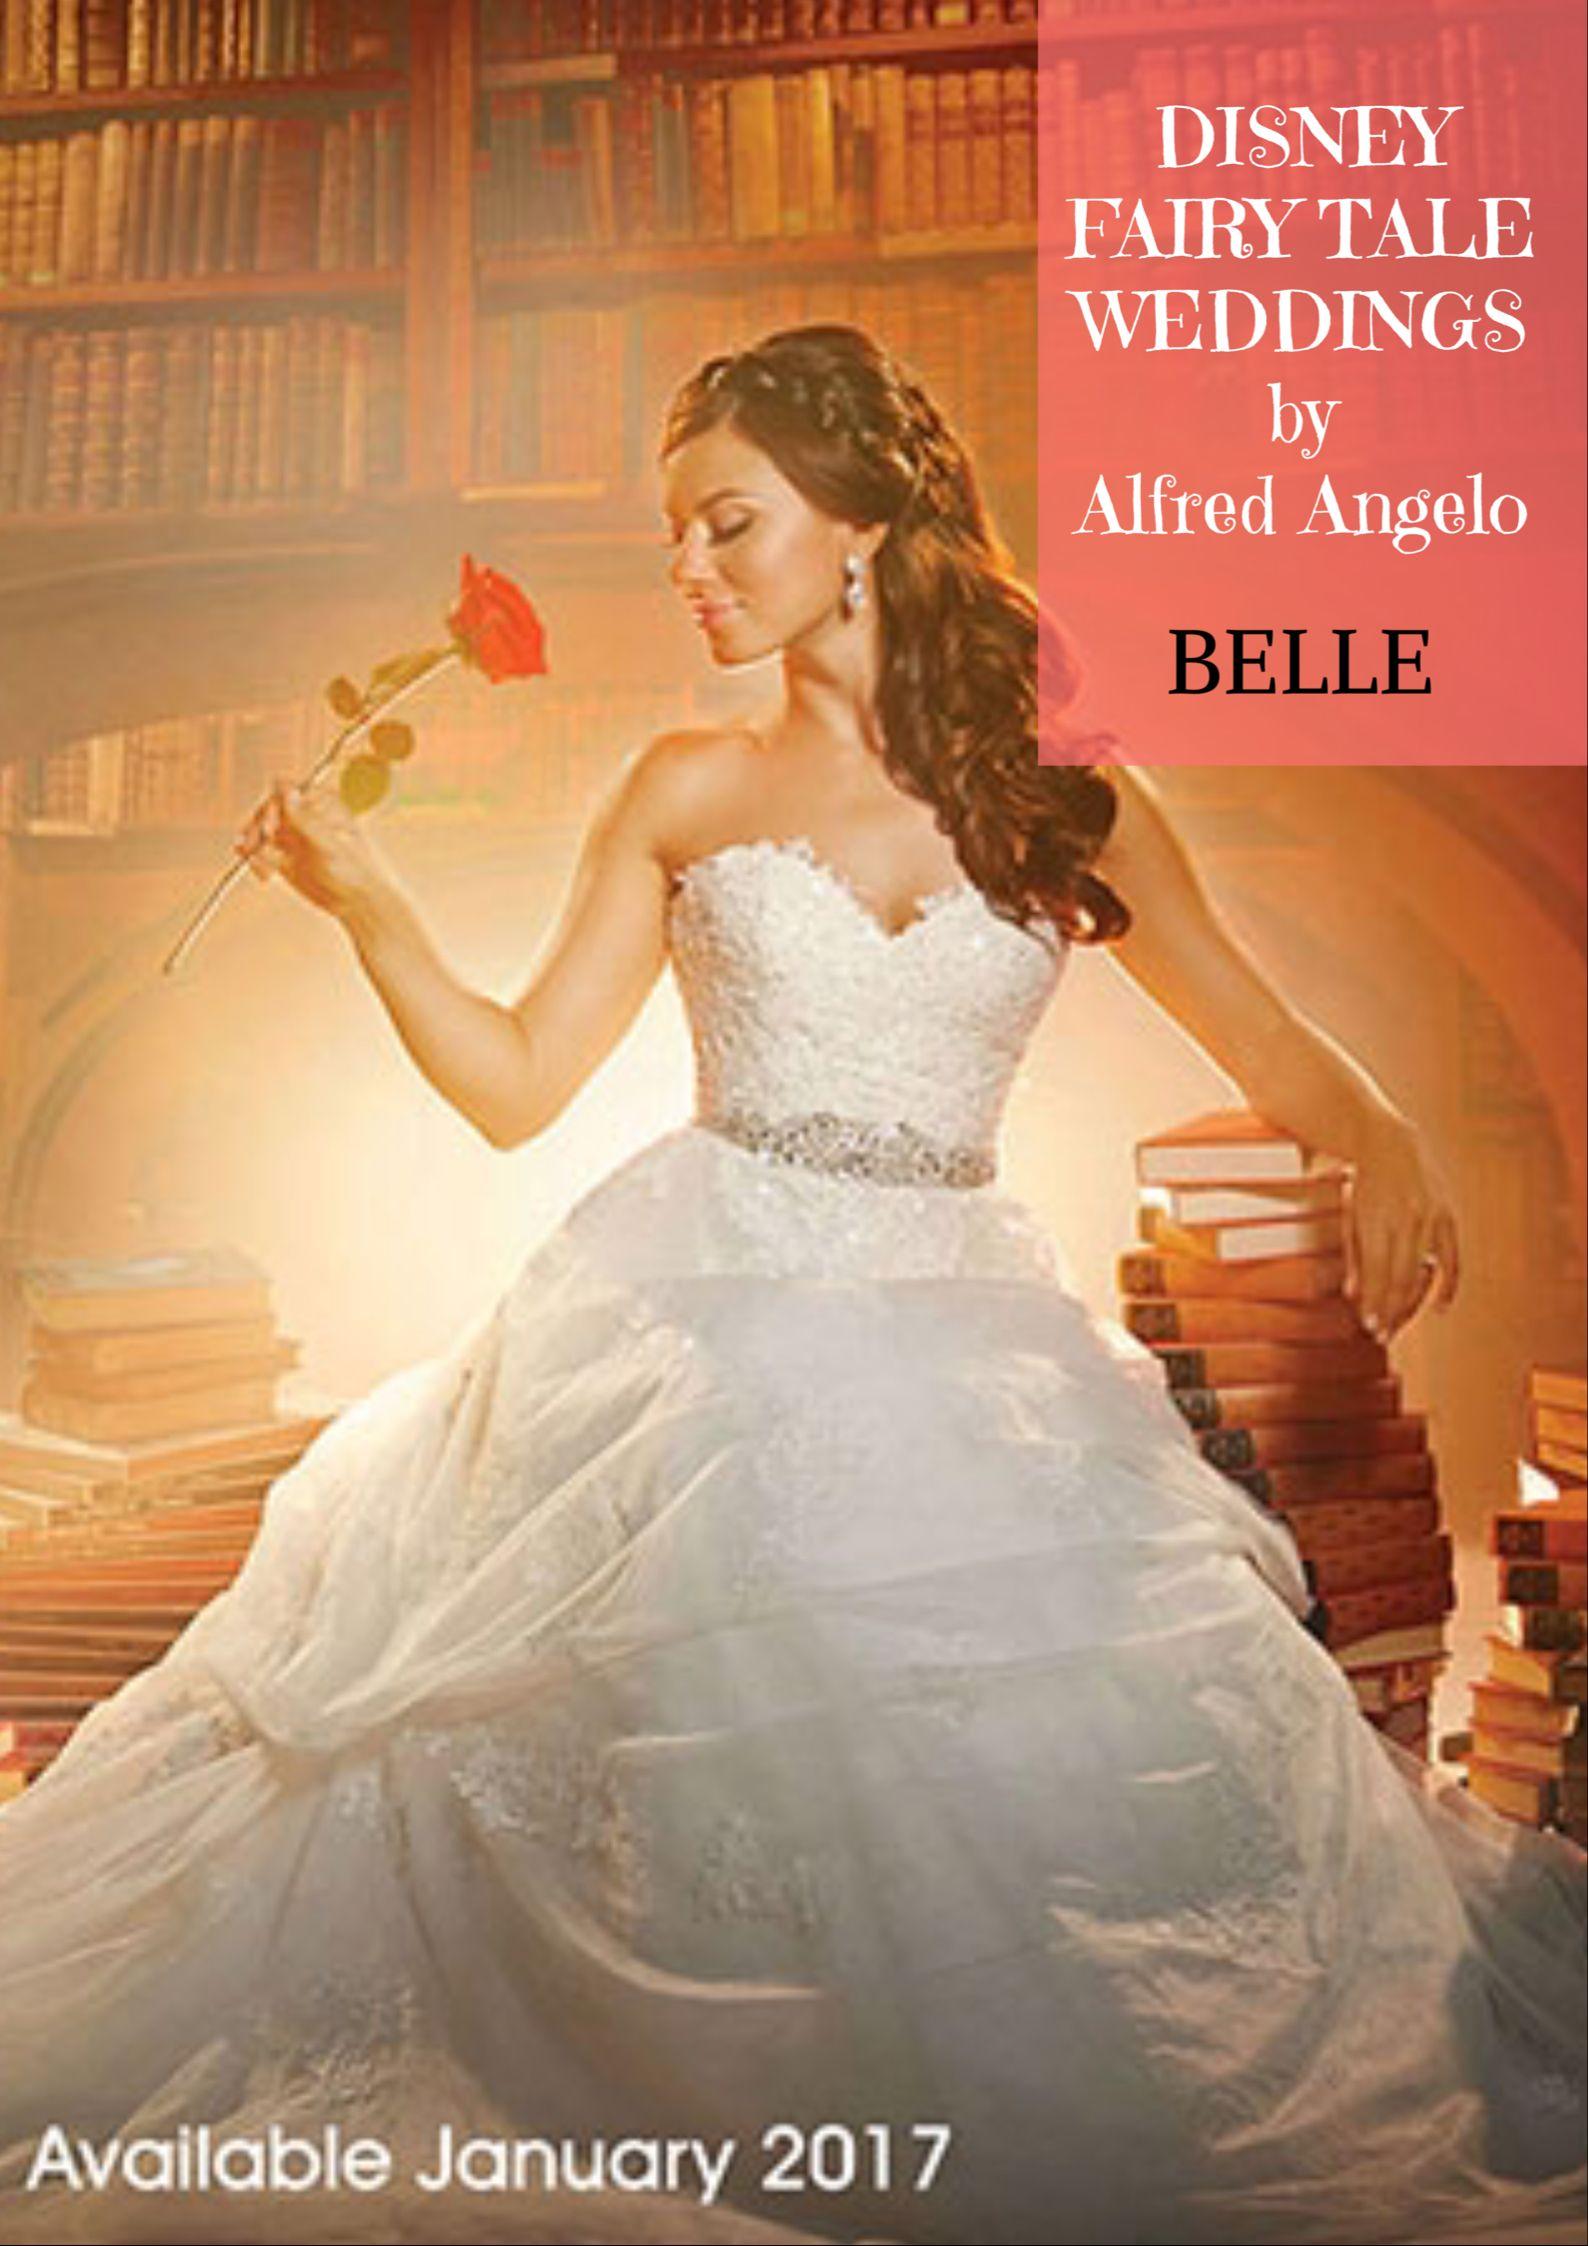 Disney Princess Belle wedding dress design for 2017 | Wedding ...